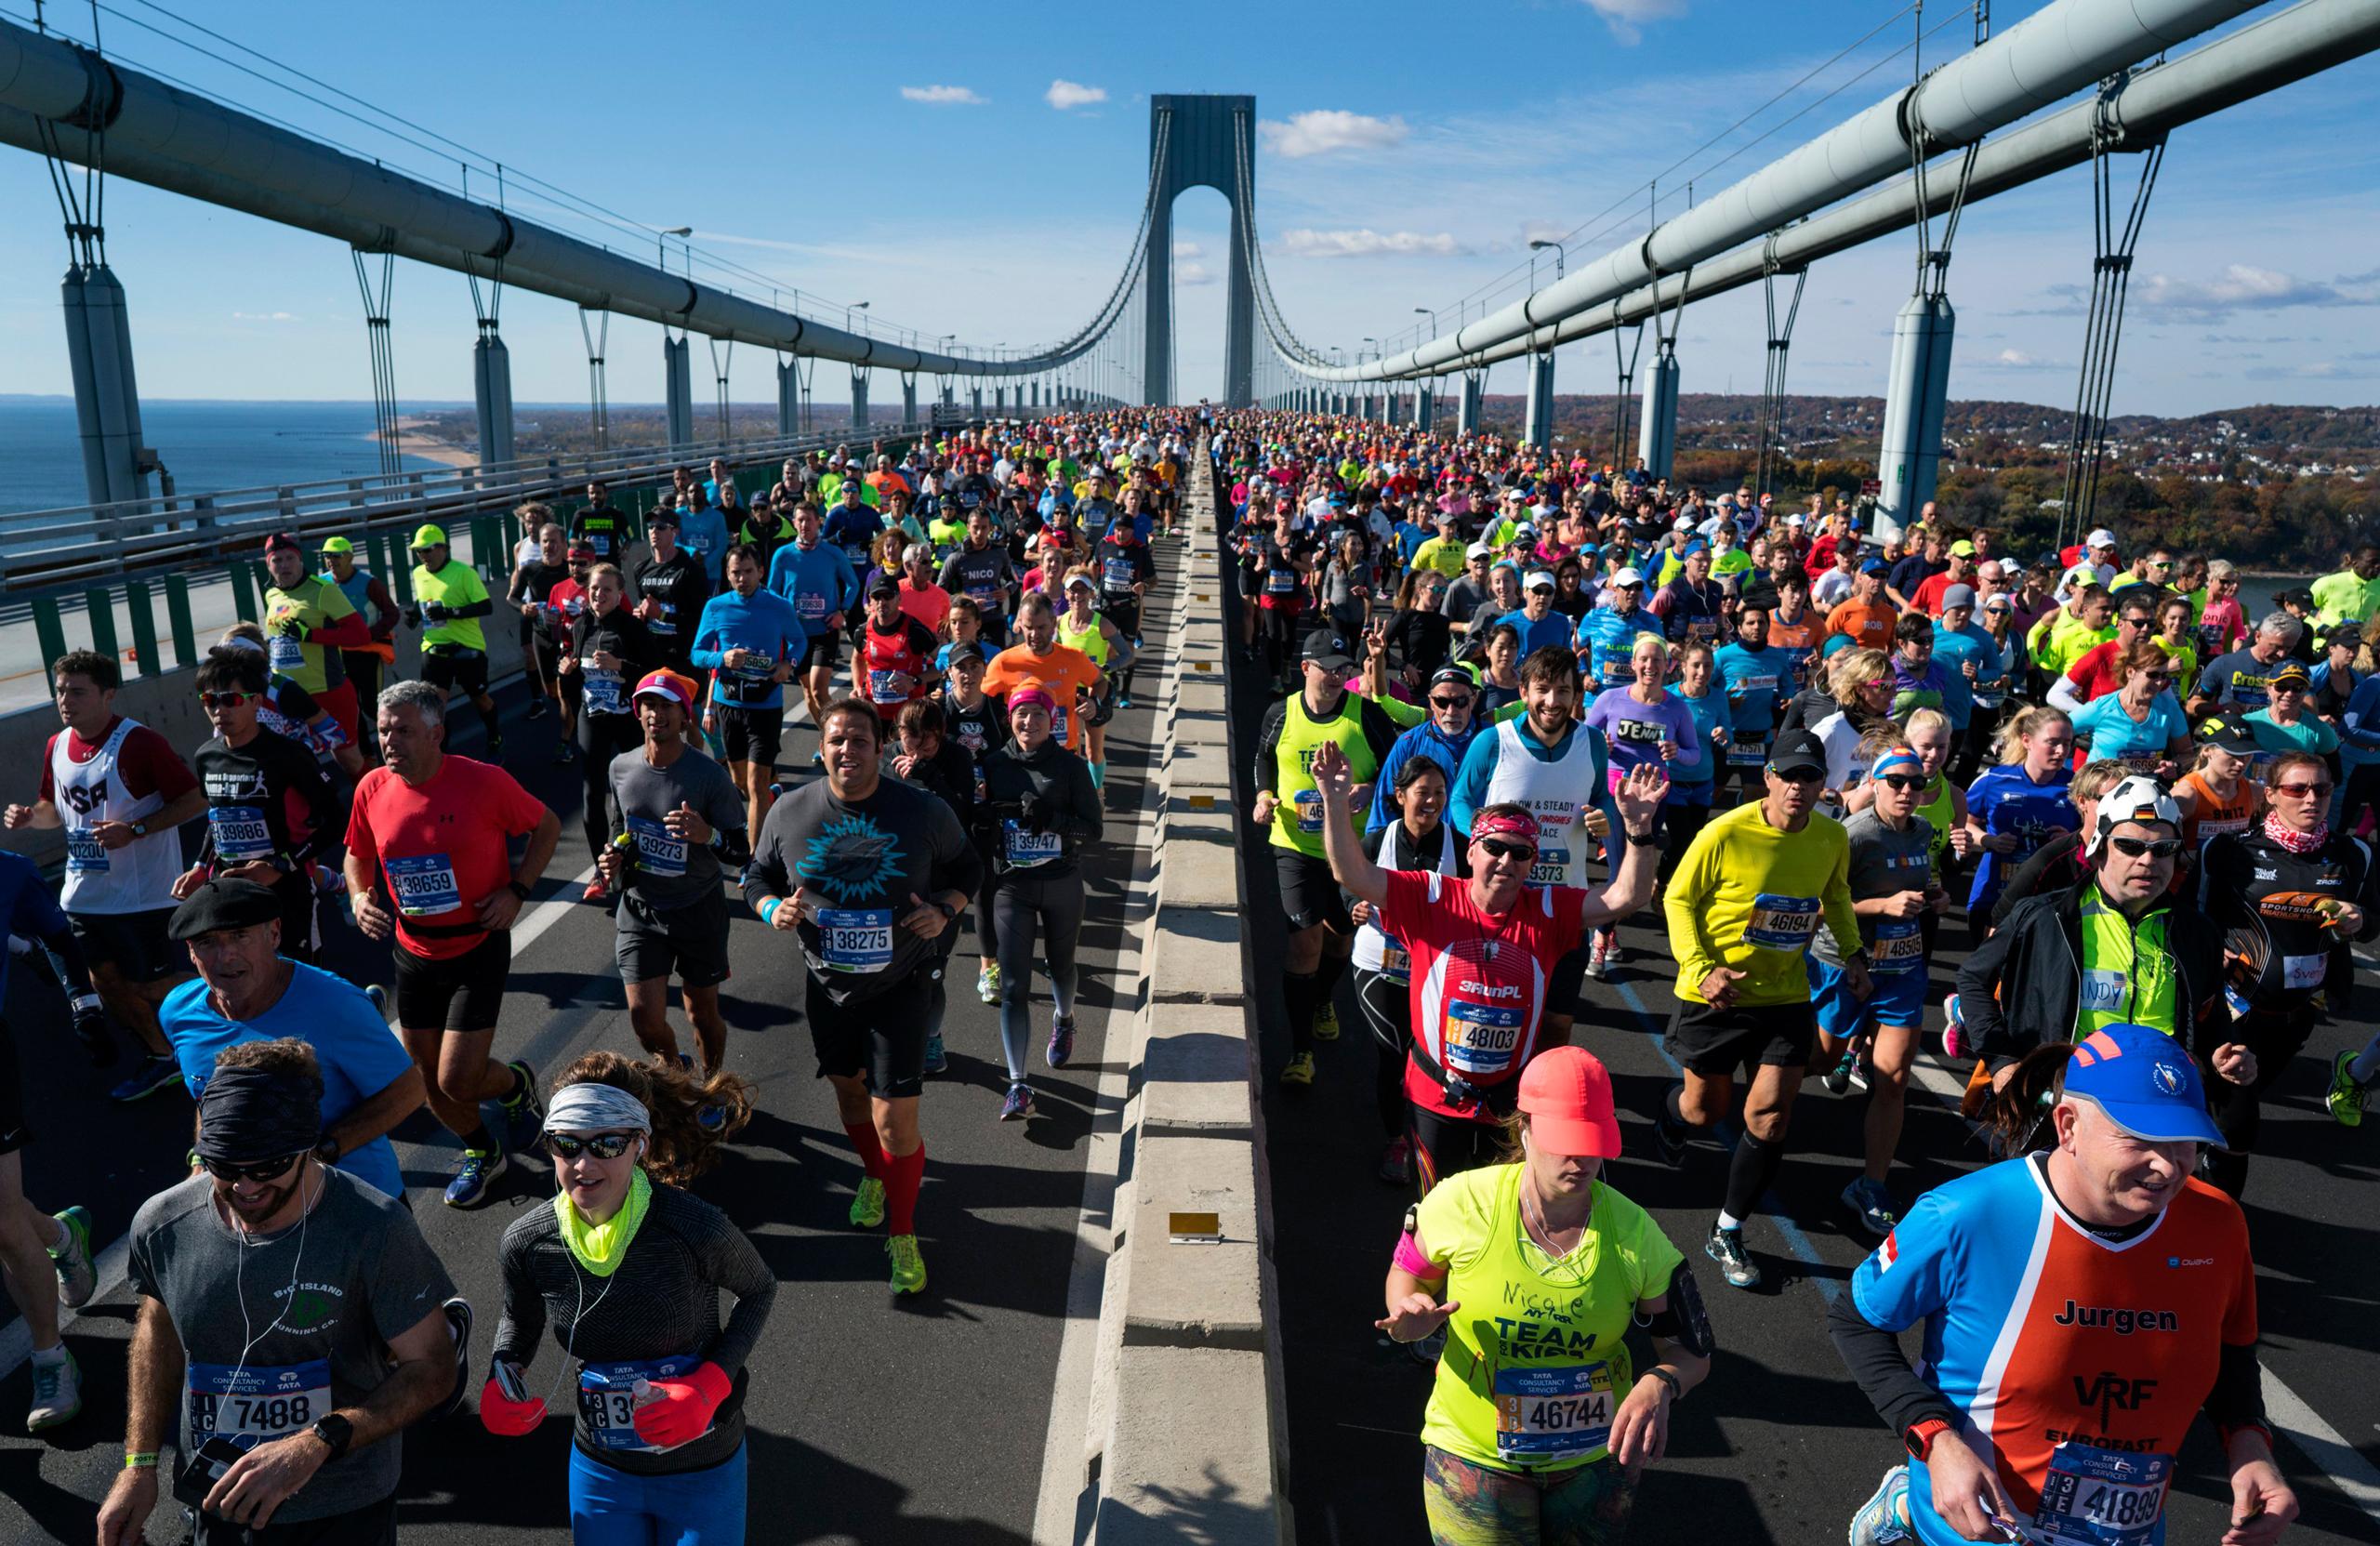 Runners cross the Verrazano-Narrows Bridge during the New York City Marathon in New York on Nov. 6, 2016